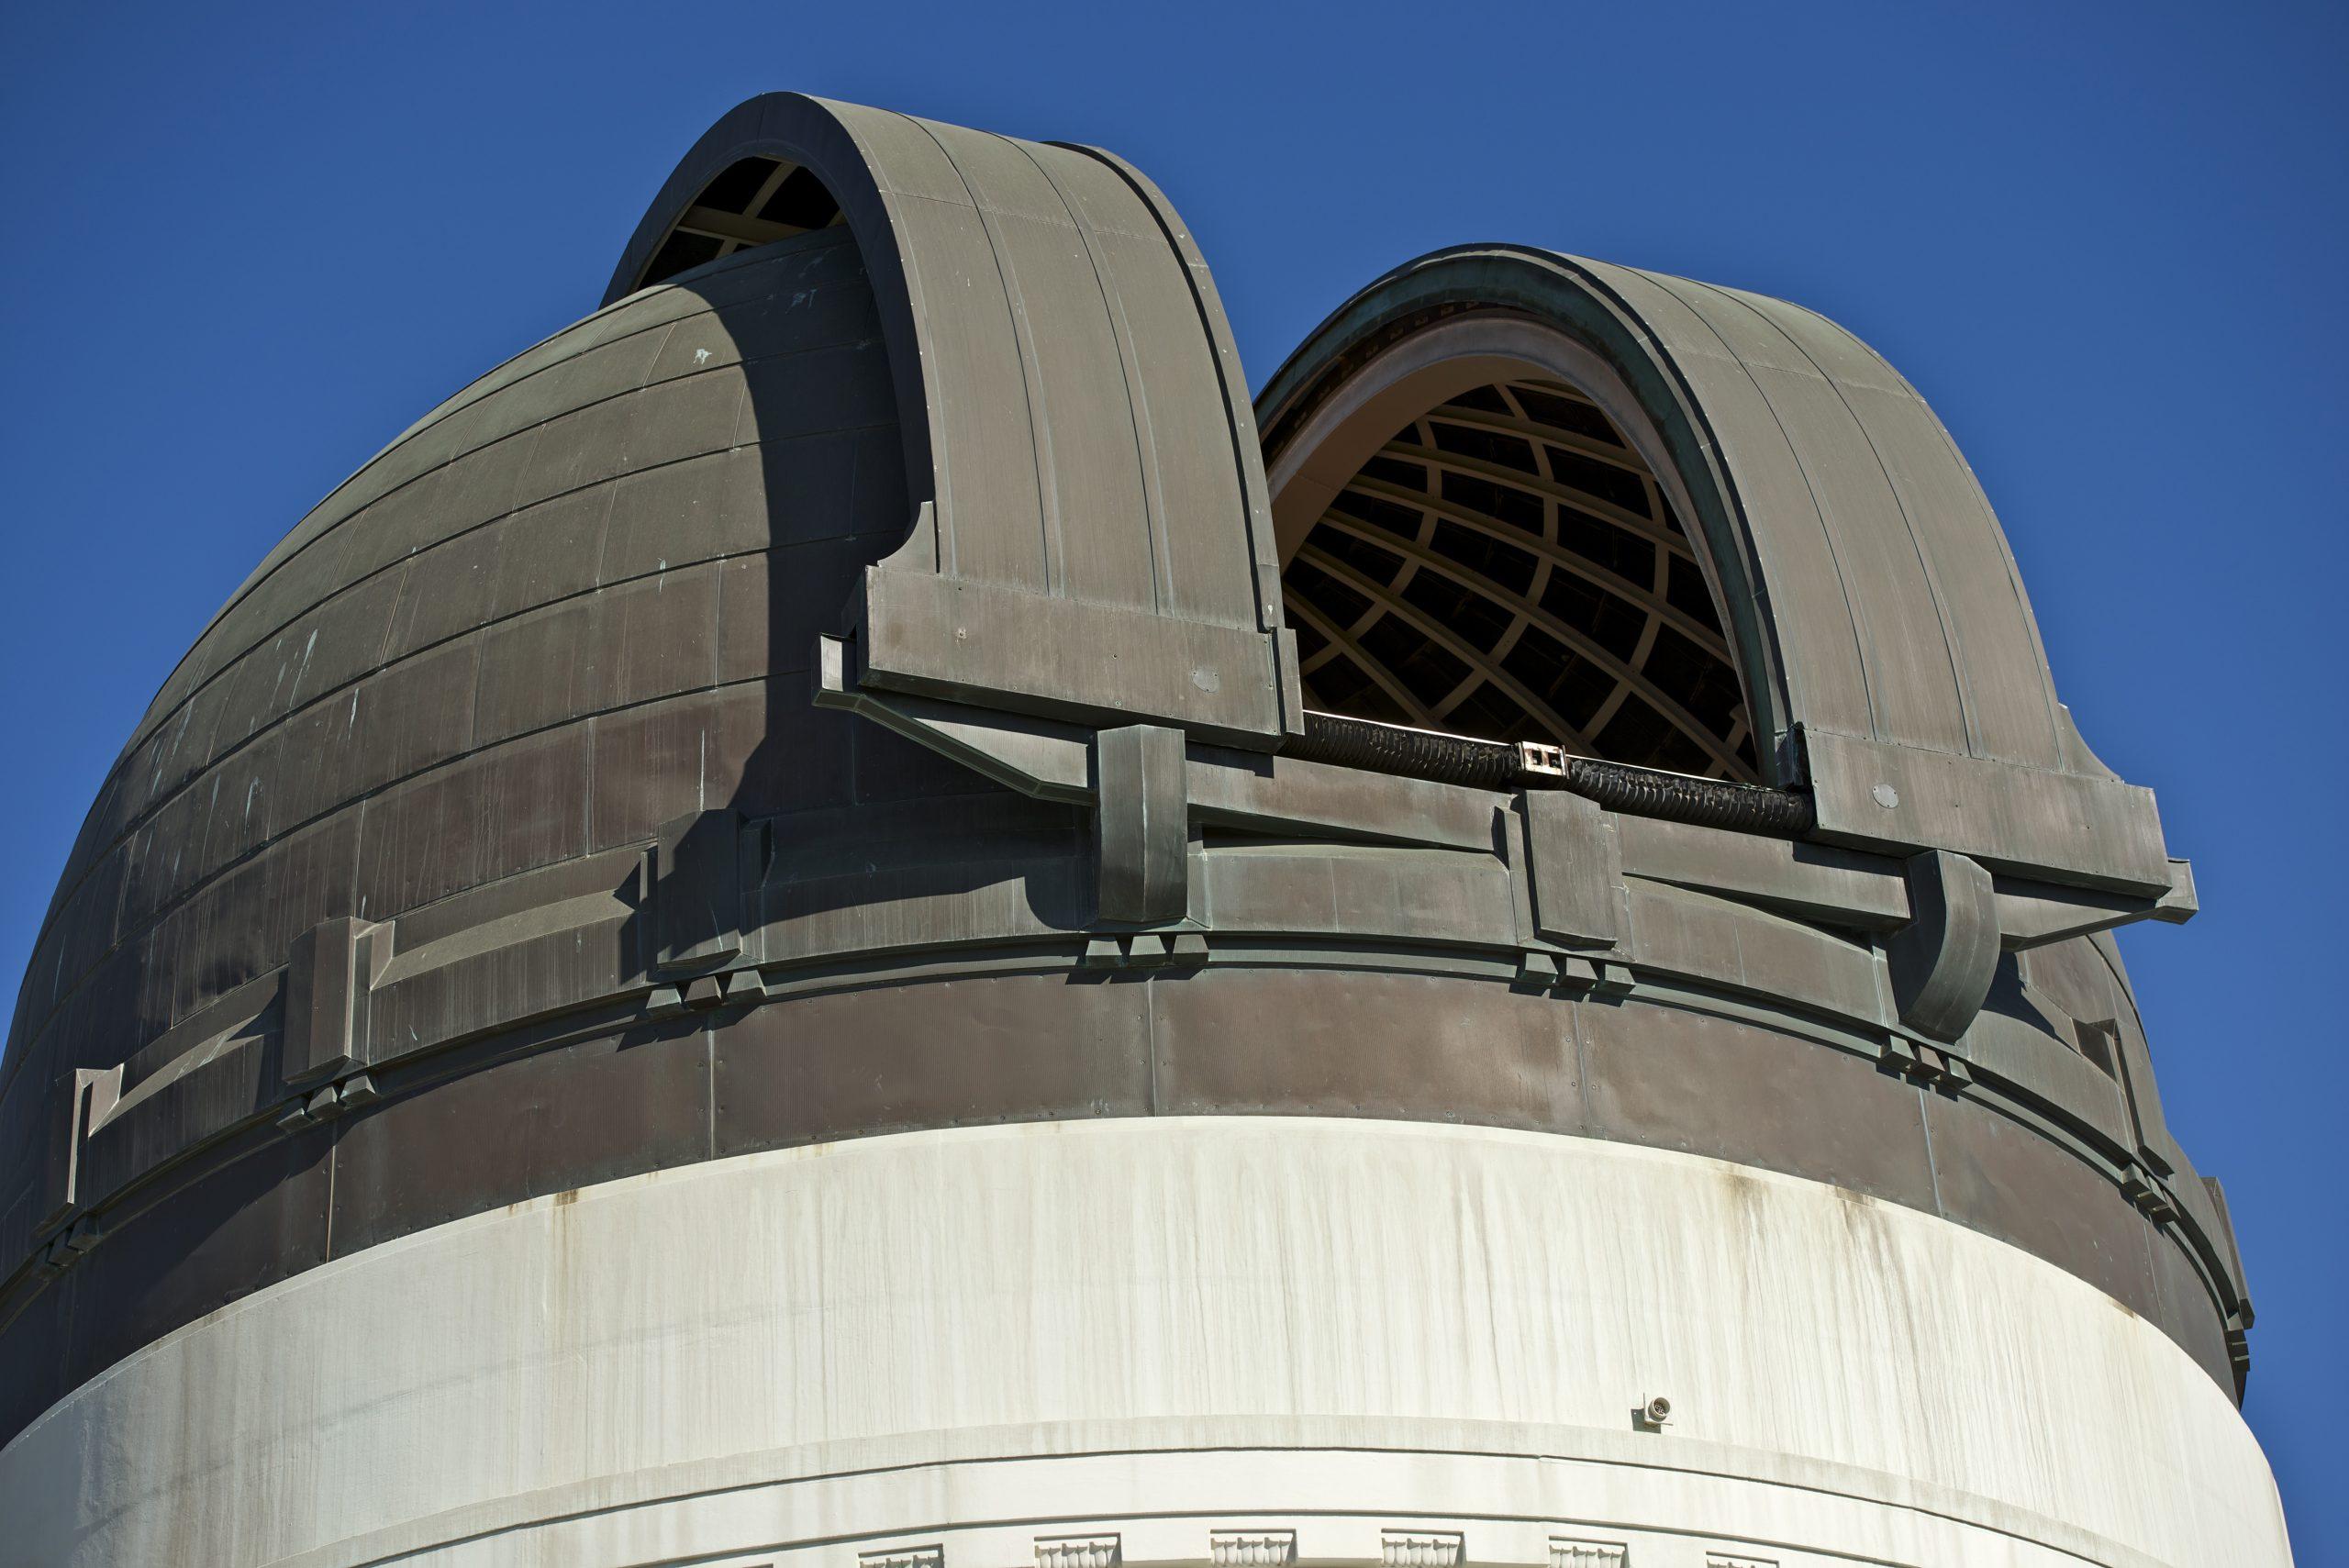 ¿Aislar el observatorio del calor o del frío?